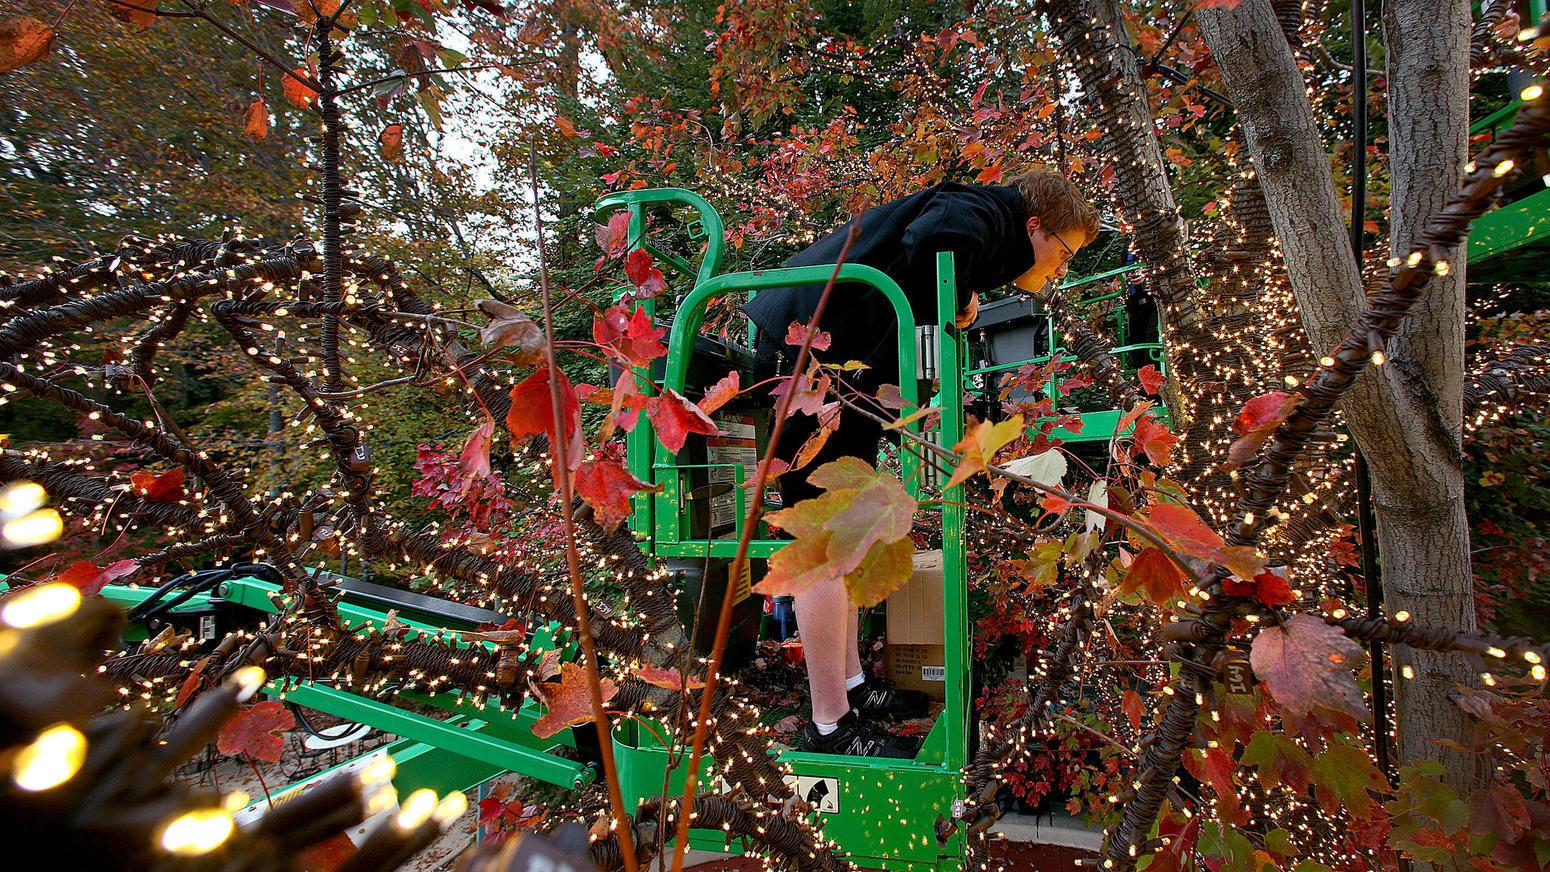 Busch gardens announces christmas town dates attractions - Busch gardens christmas town rides ...